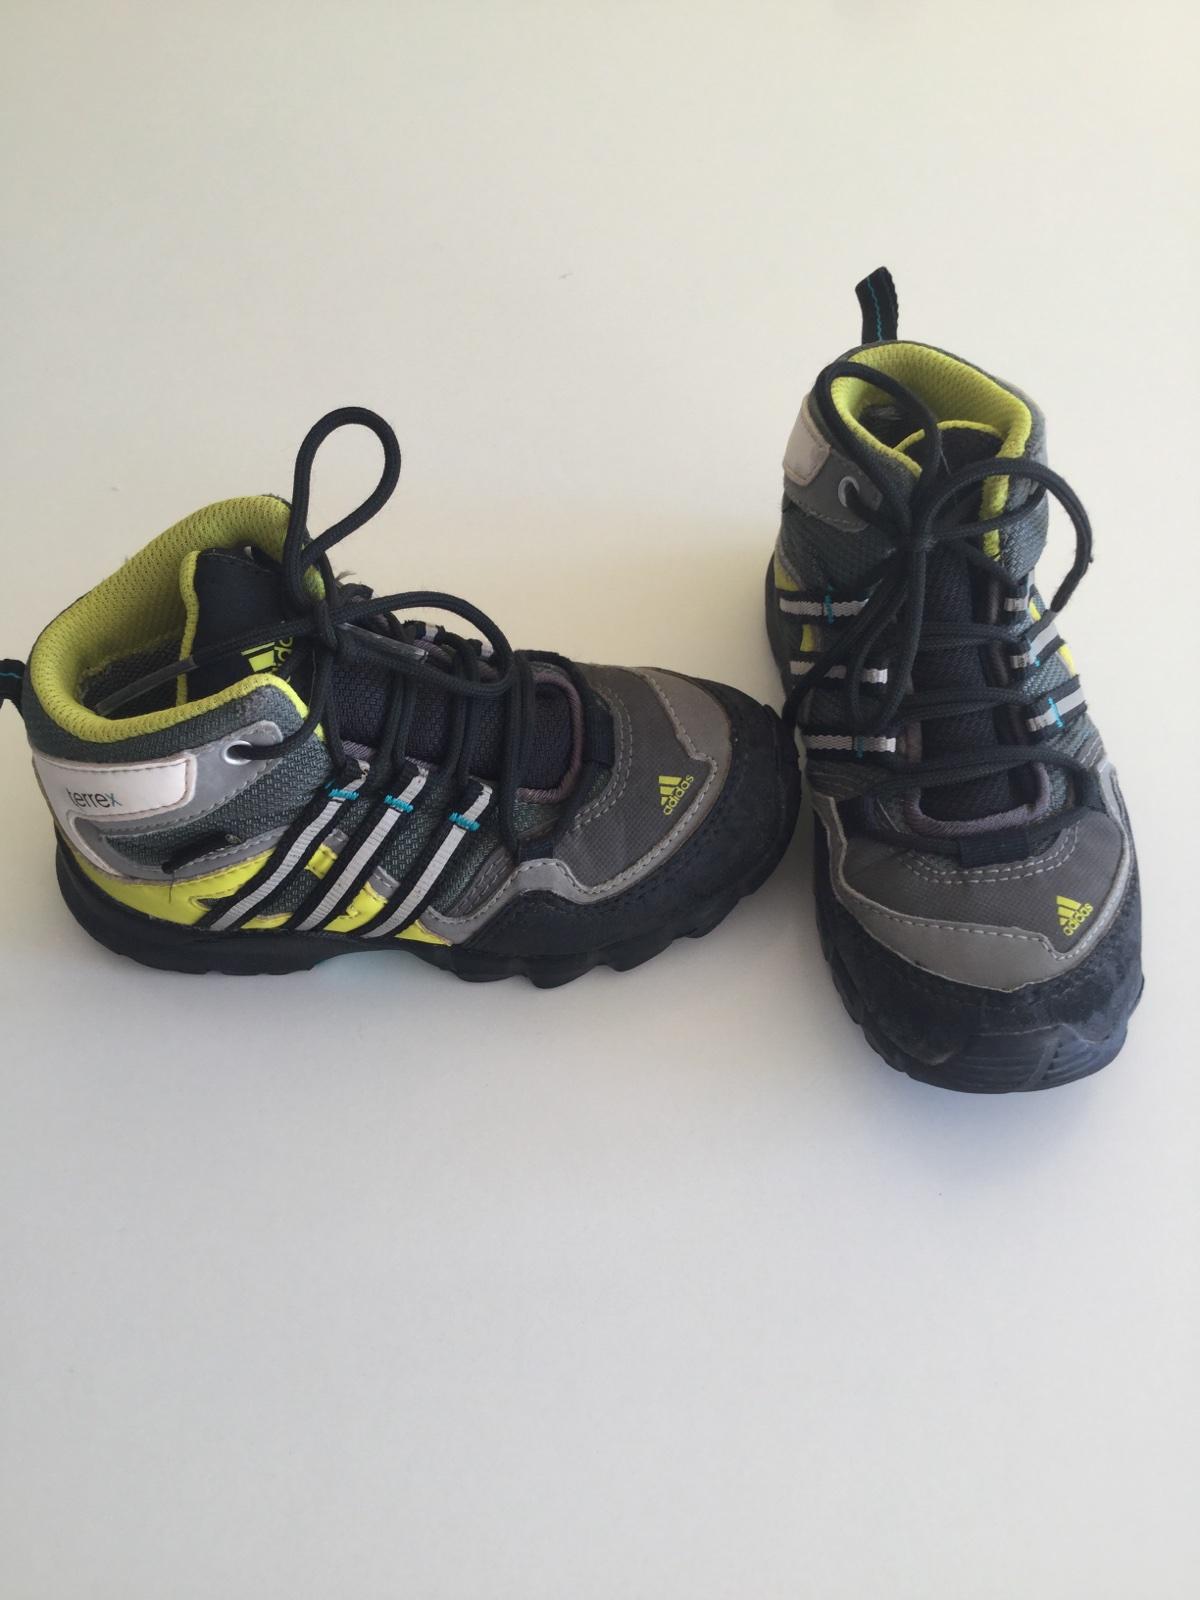 Goretexové adidas boty kotníčkové 9c2757f69dd